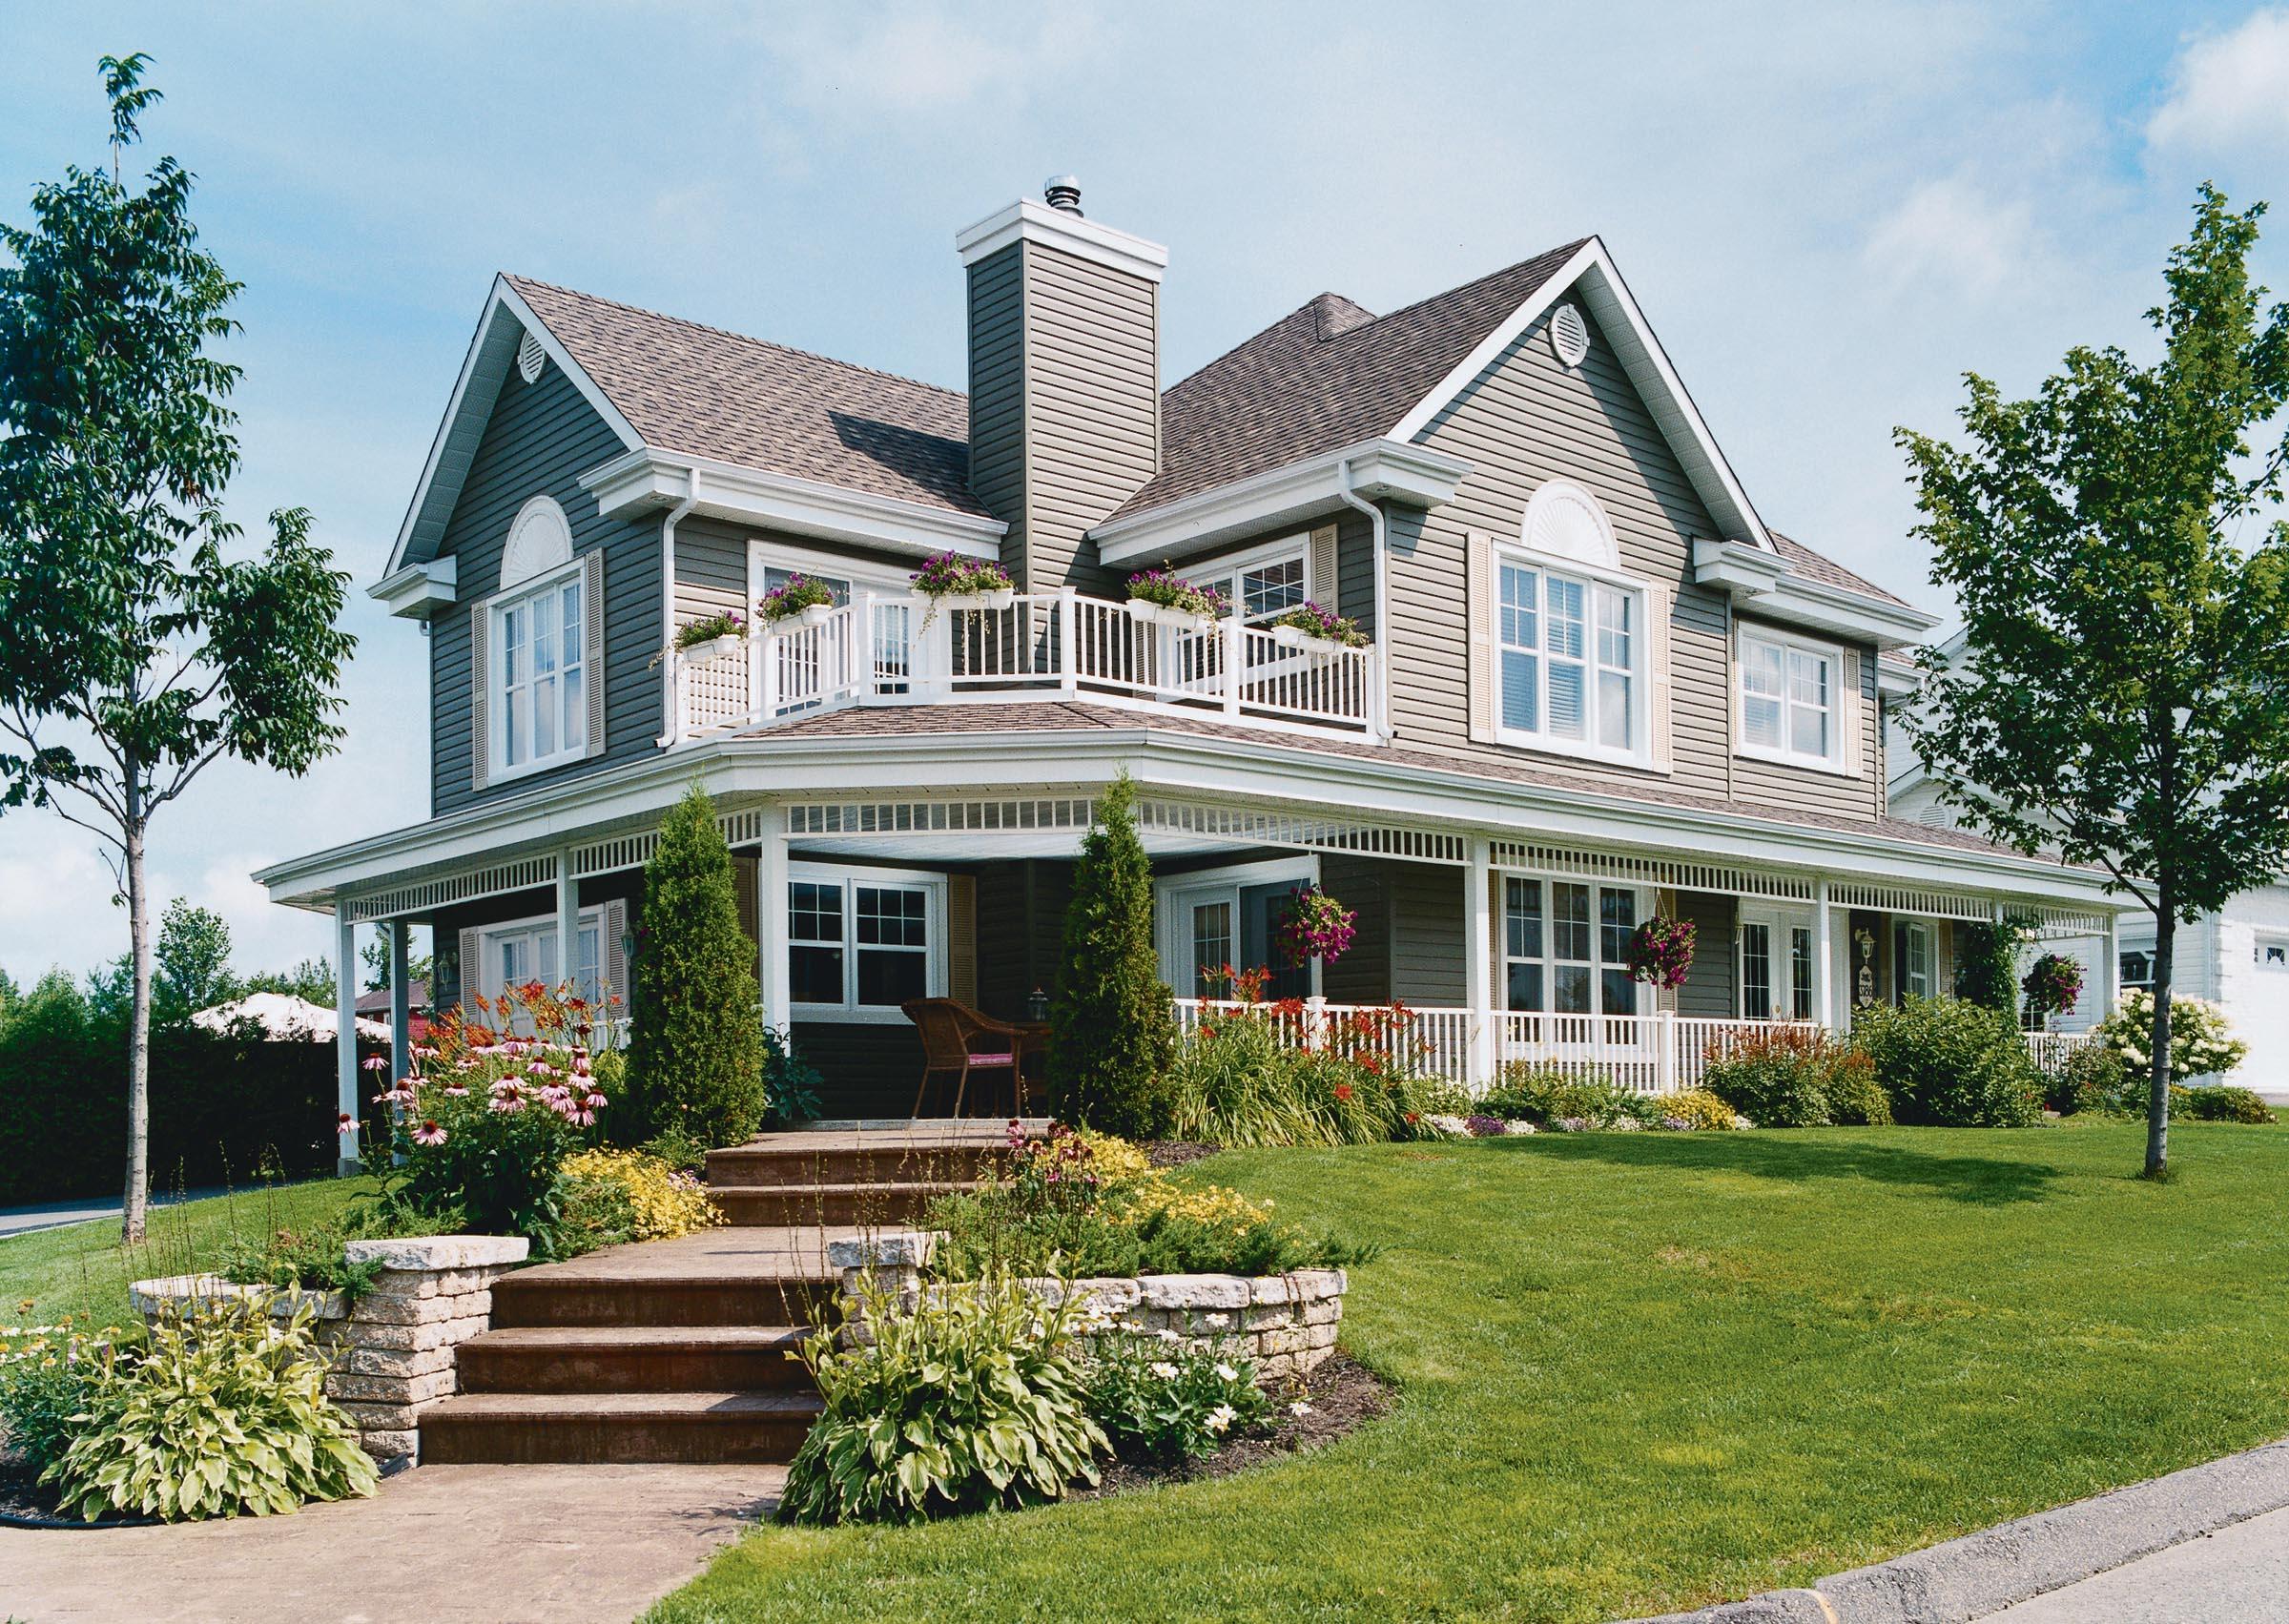 Three Bedroom House Plan With Wraparound Porch Sdl Custom Homes